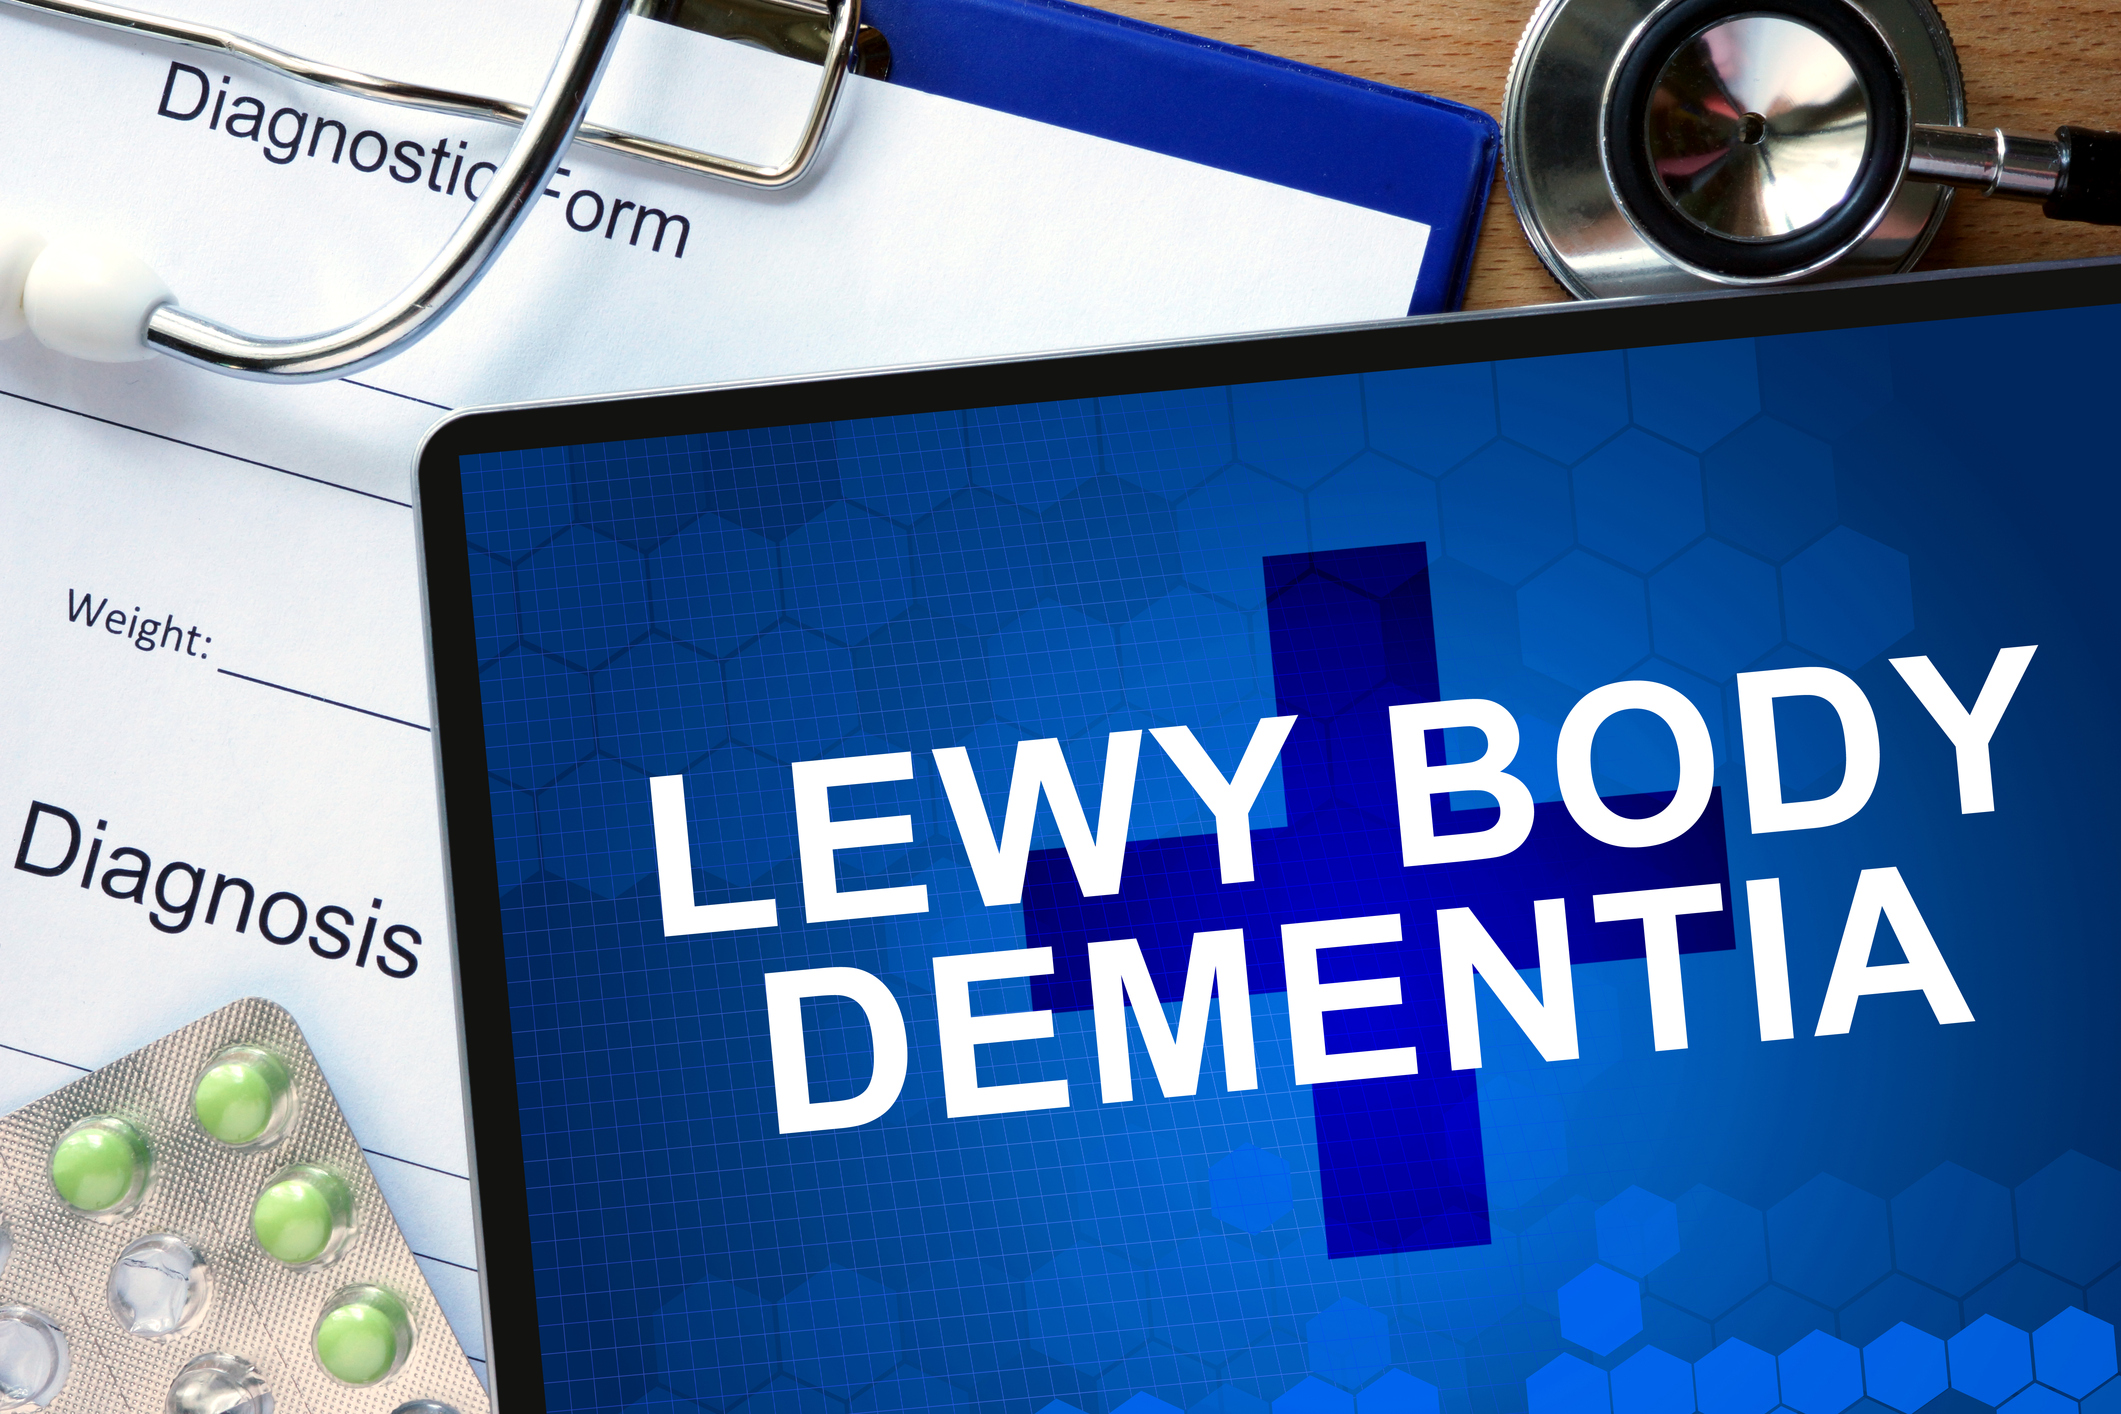 Lewy body dementia, an umbrella term for both Parkinson's